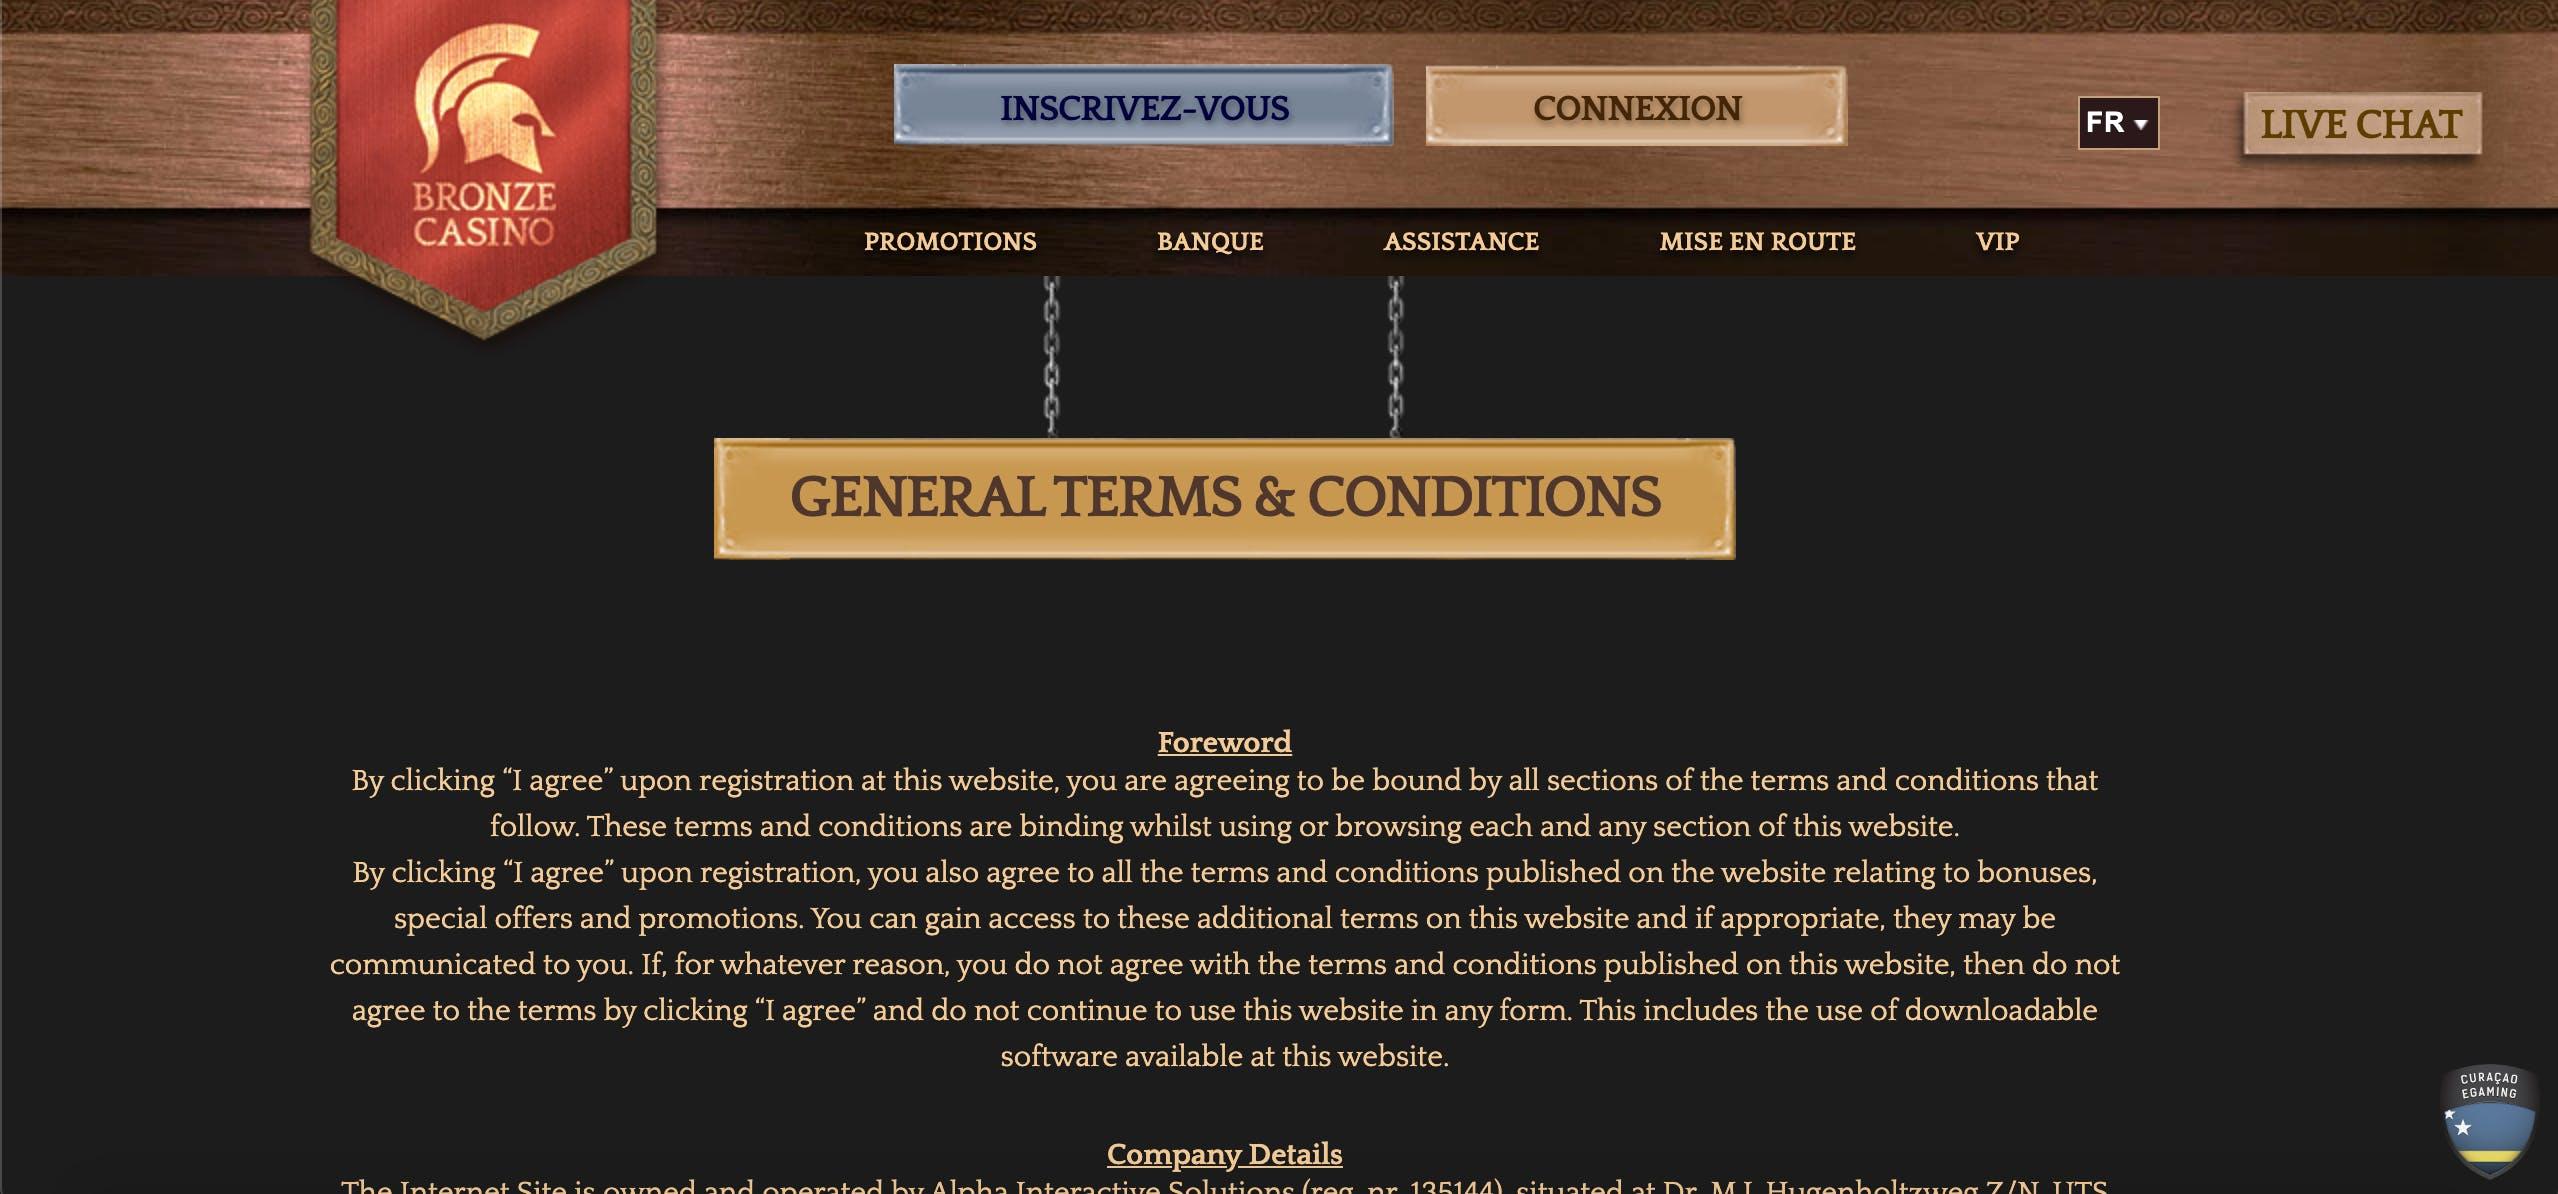 changing langage bronze casino